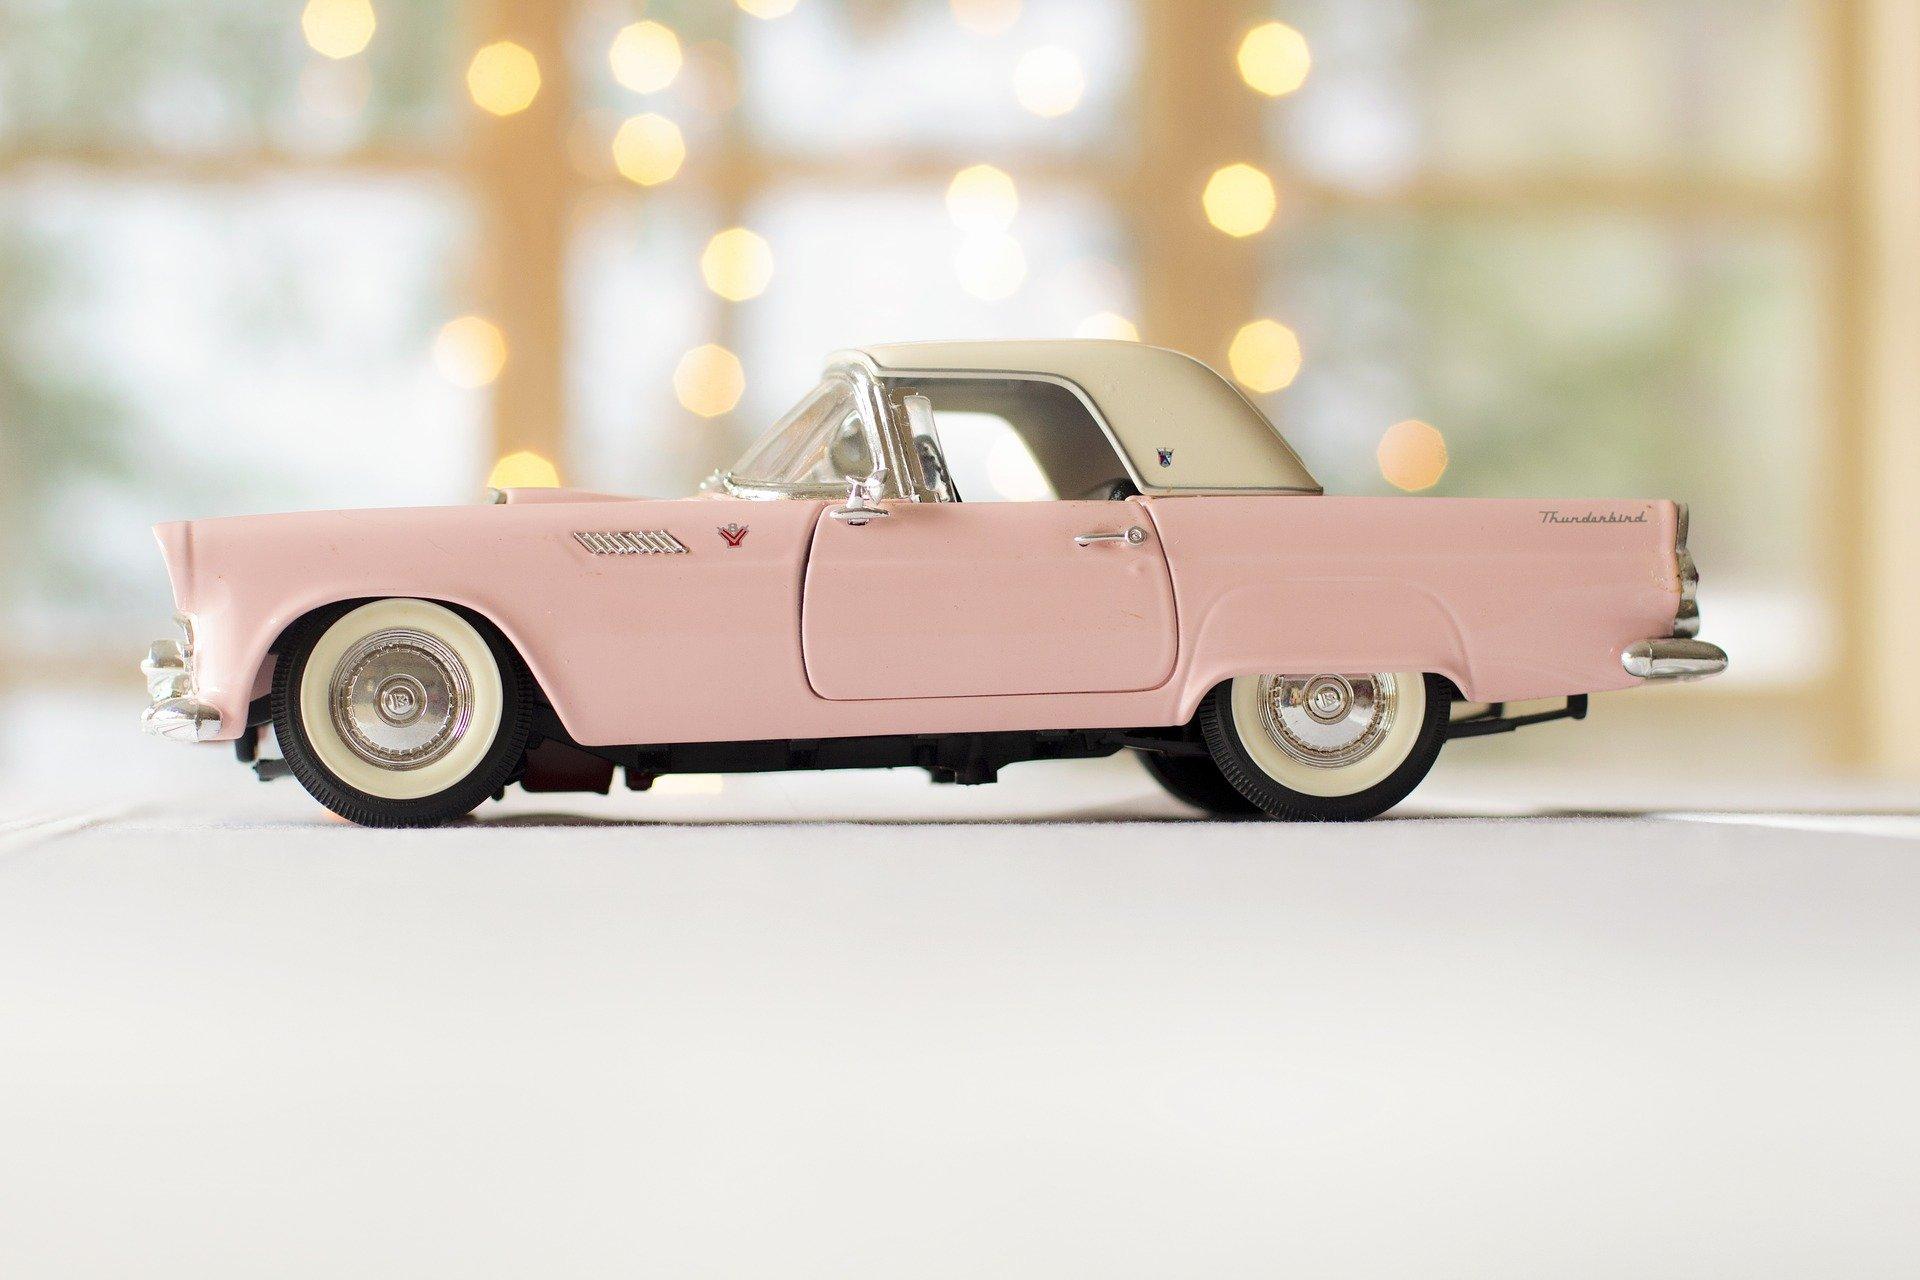 Car Pink Car Thunderbird Drive Driving Vintage